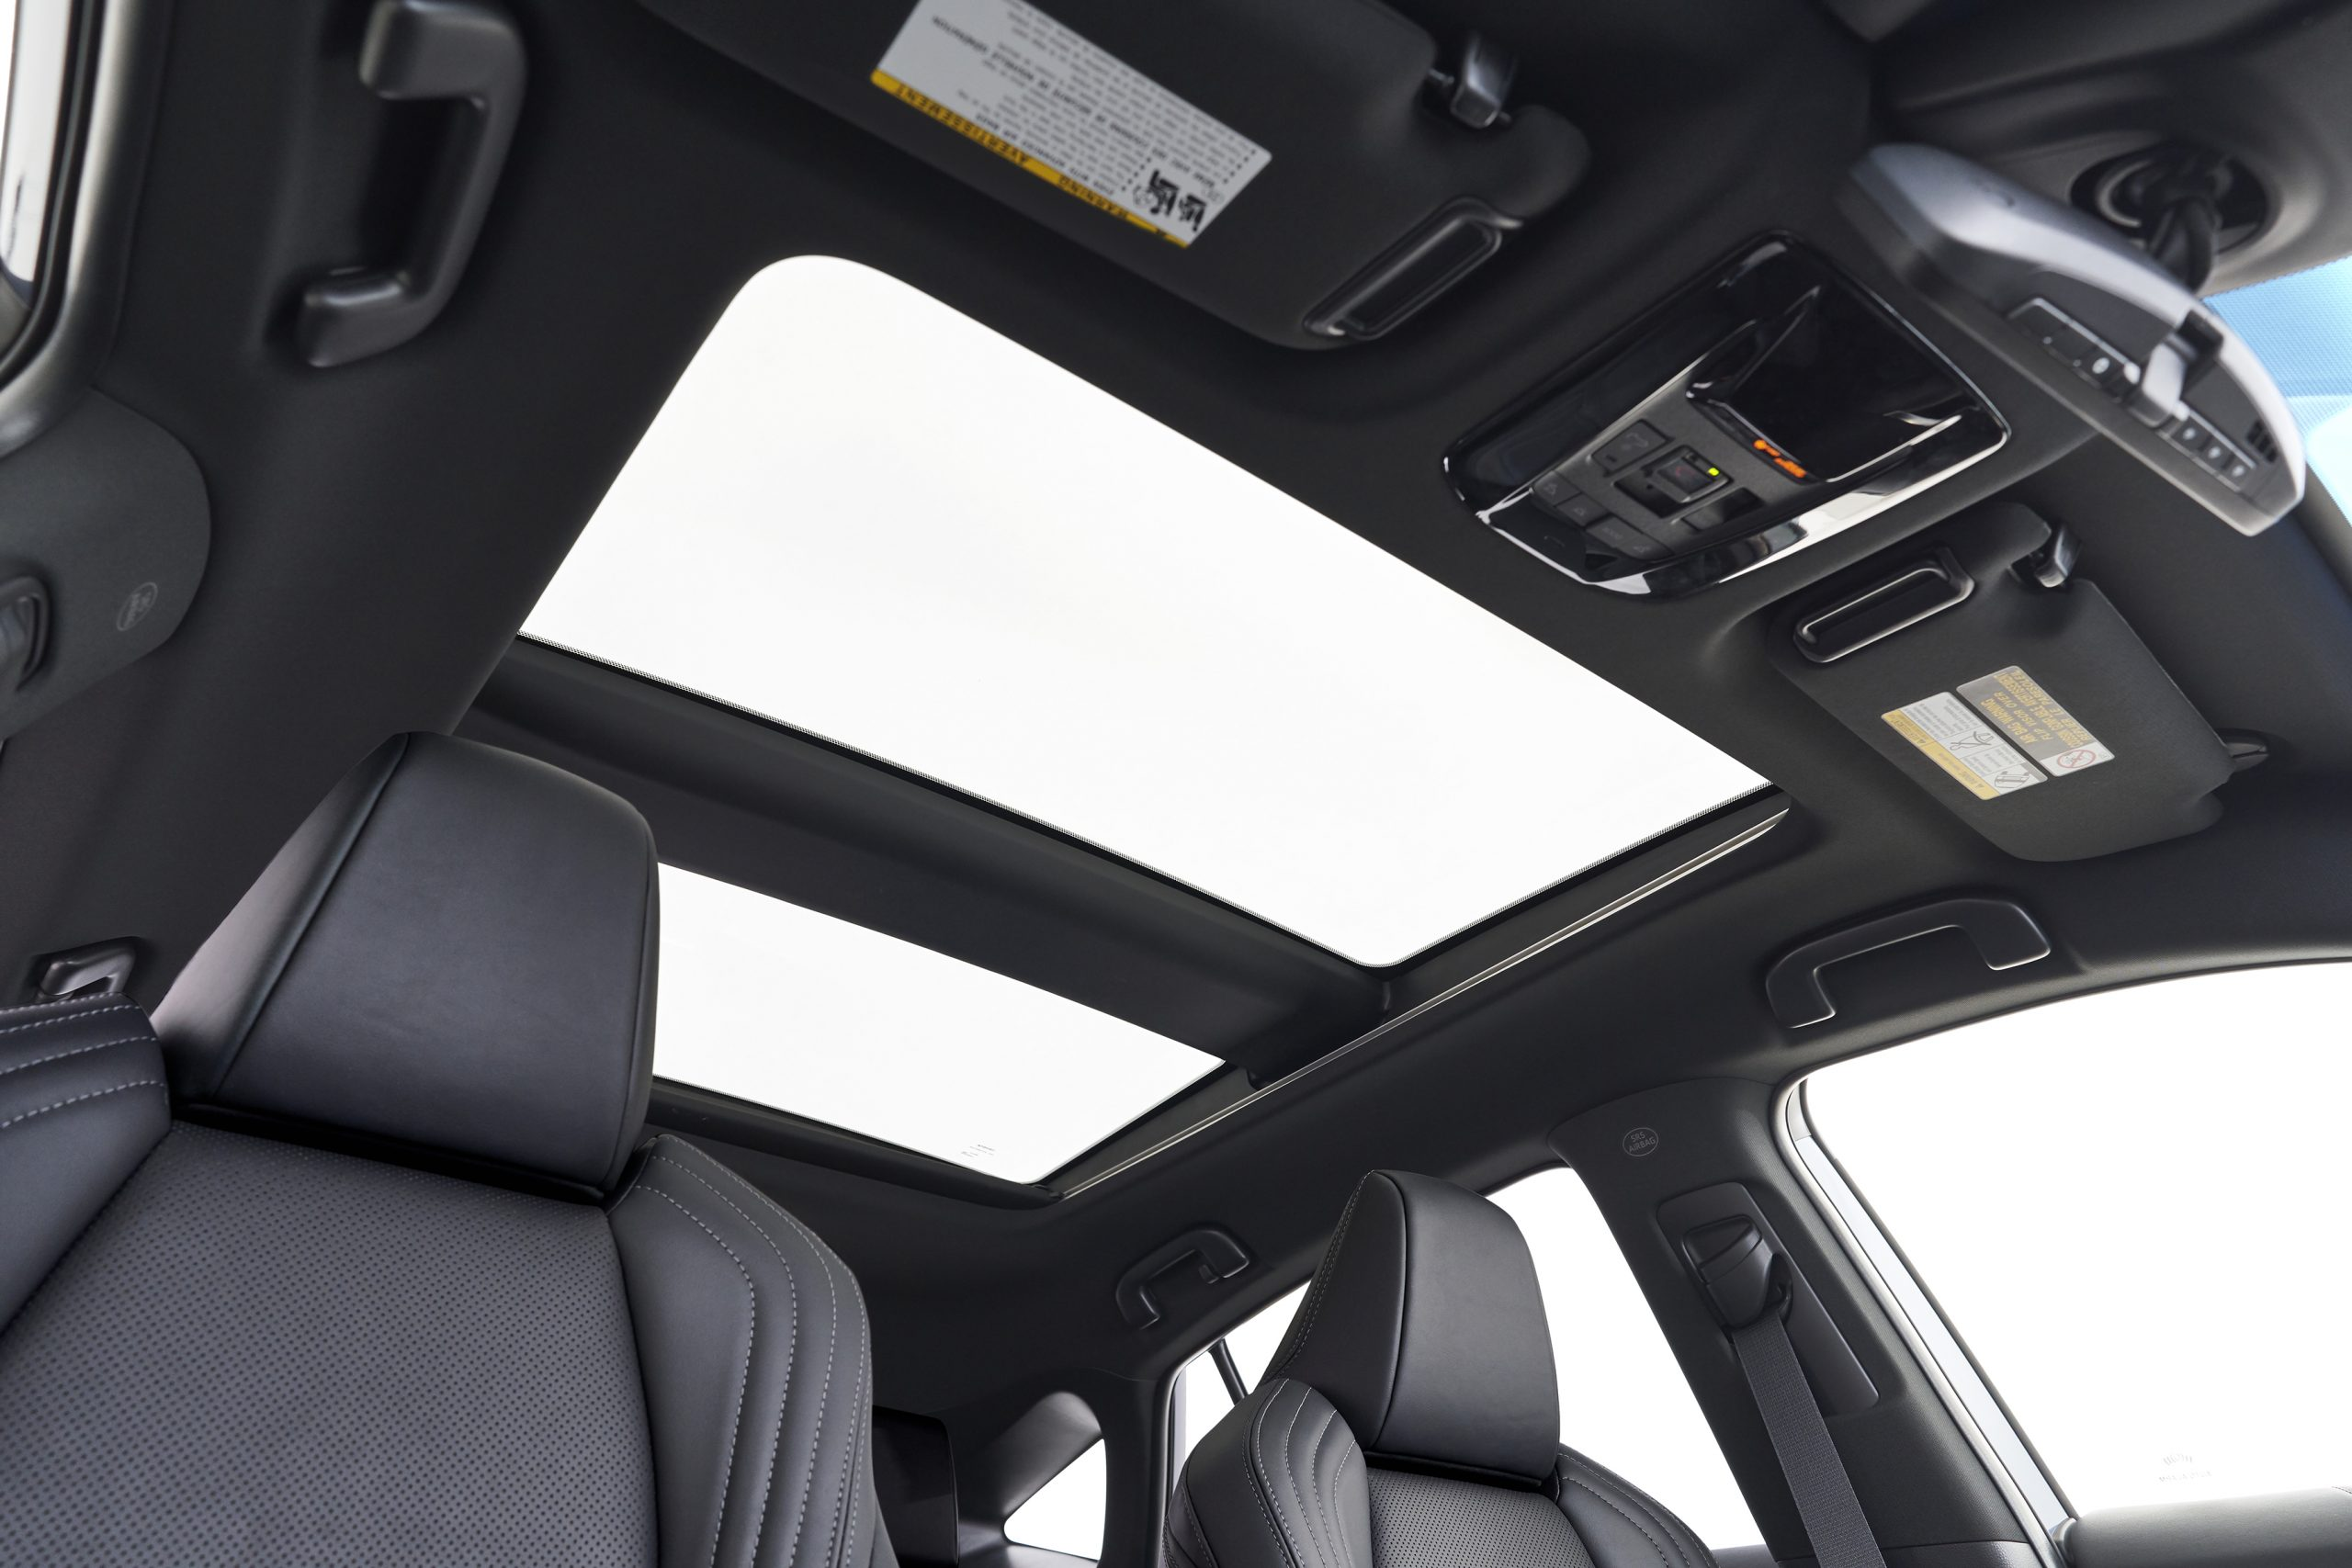 2021-Toyota-Venza_Interior_018-scaled.jpg